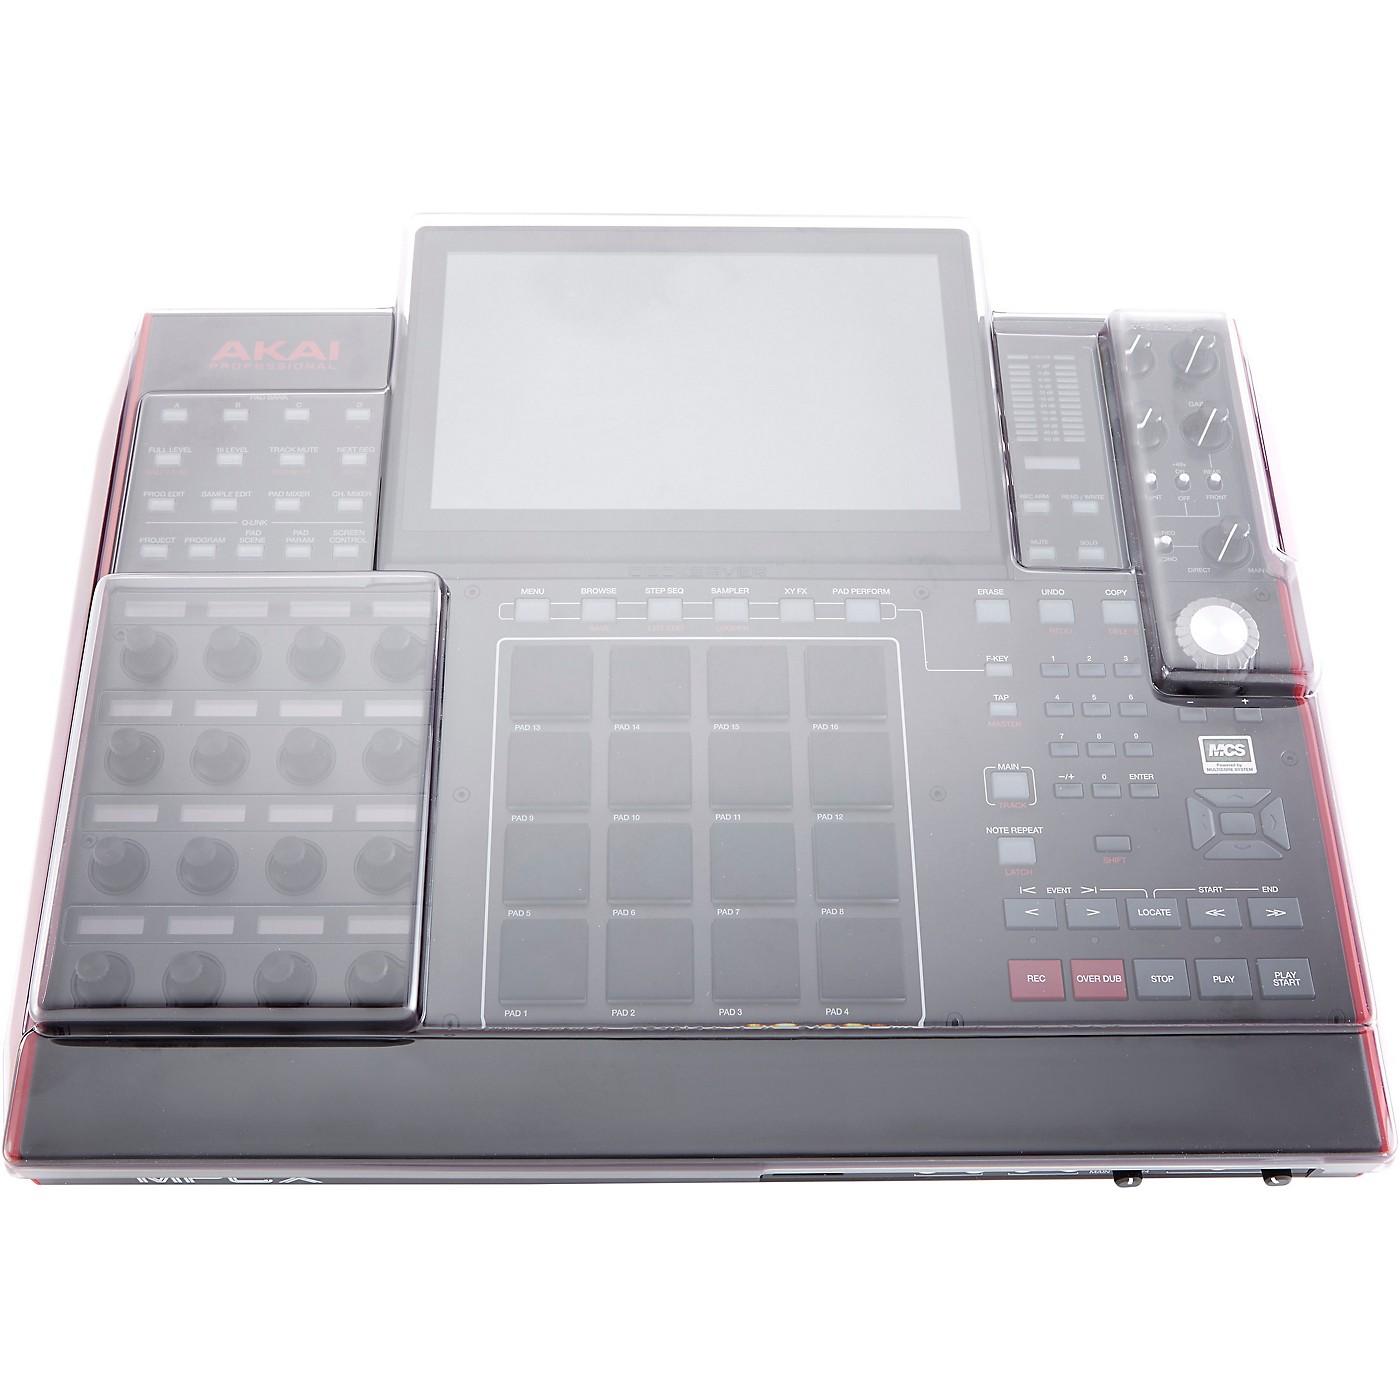 Decksaver Clear Polycarbonate Cover for Akai MPC X Sequencer thumbnail